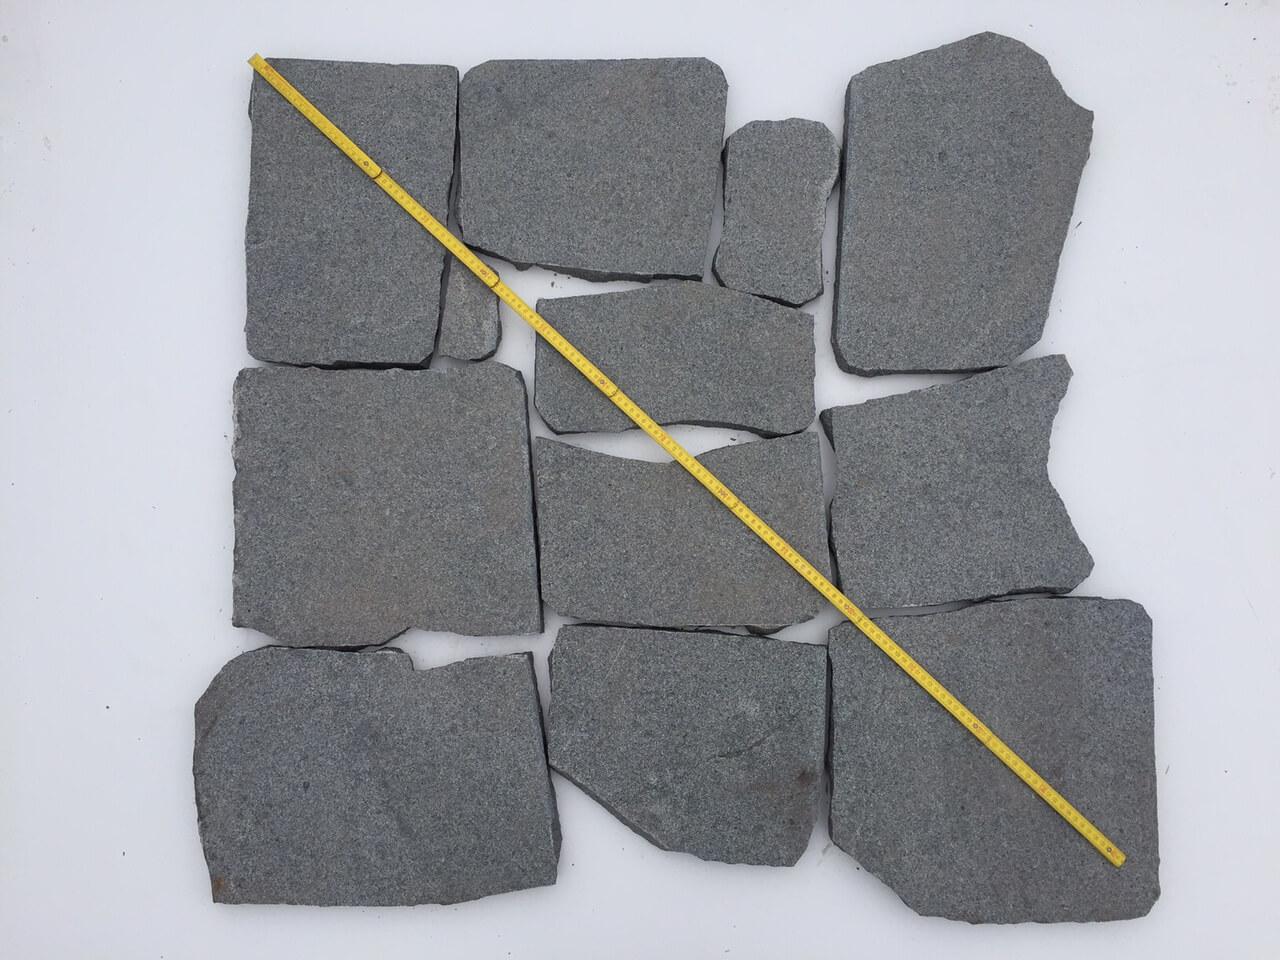 granit polygonalplatte dunkelgrau unregelm ig gebrochen. Black Bedroom Furniture Sets. Home Design Ideas